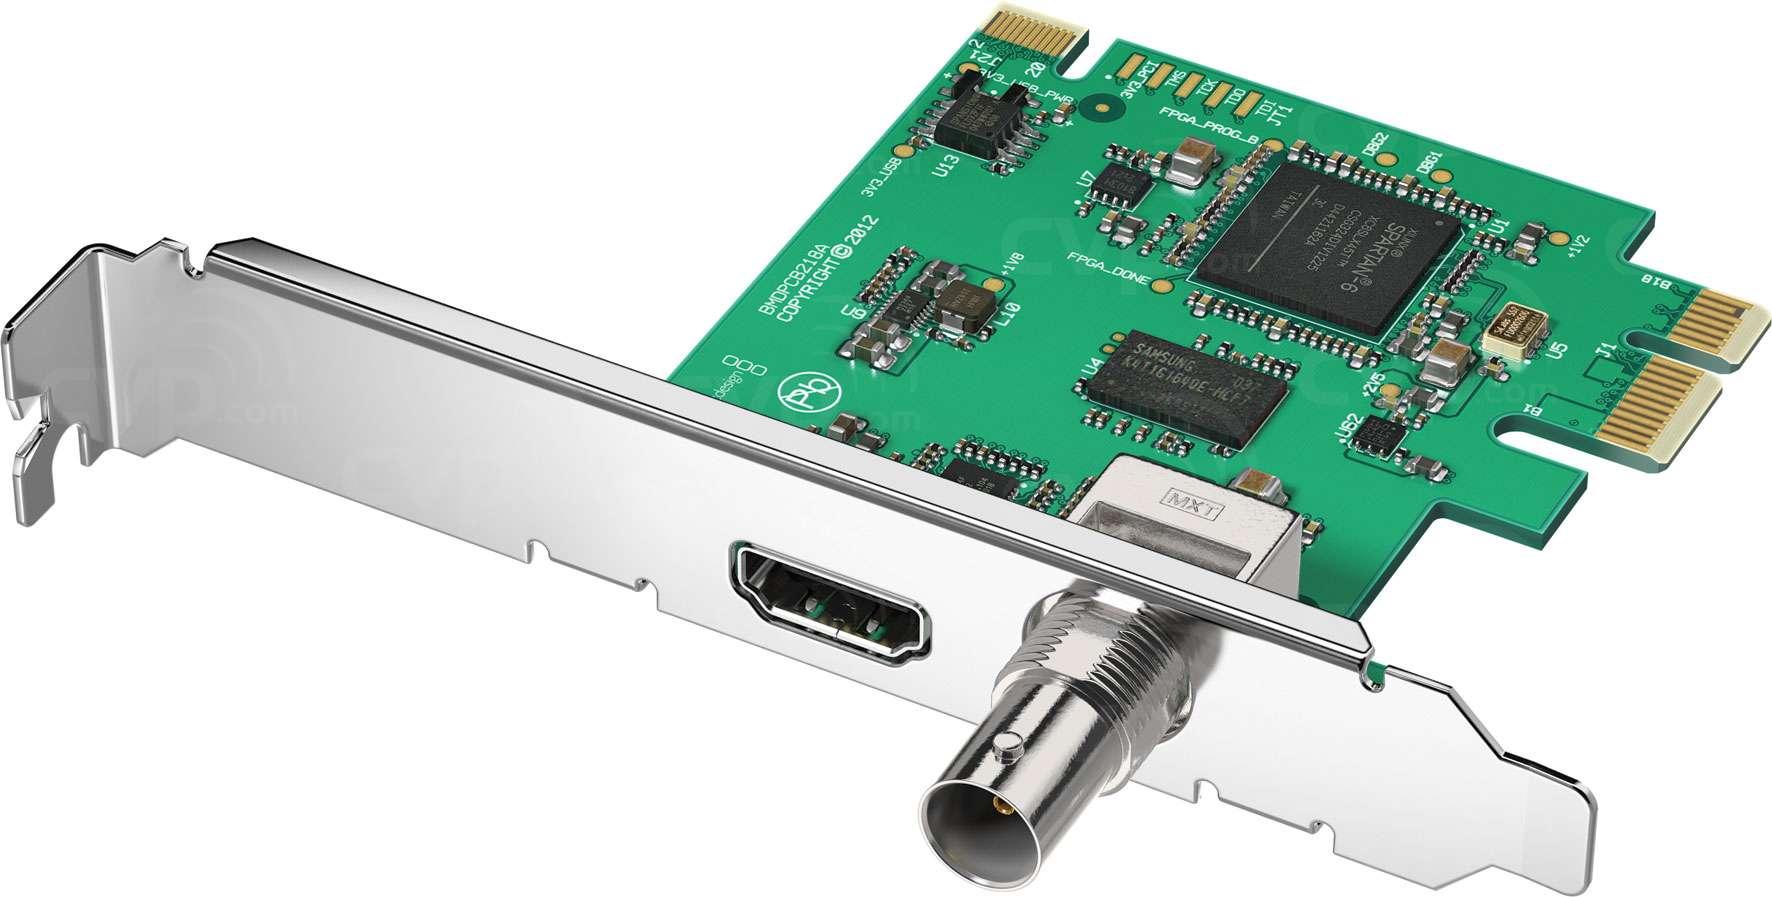 Blackmagic Design Decklink Mini Monitor - PCIe playback for 3G-SDI